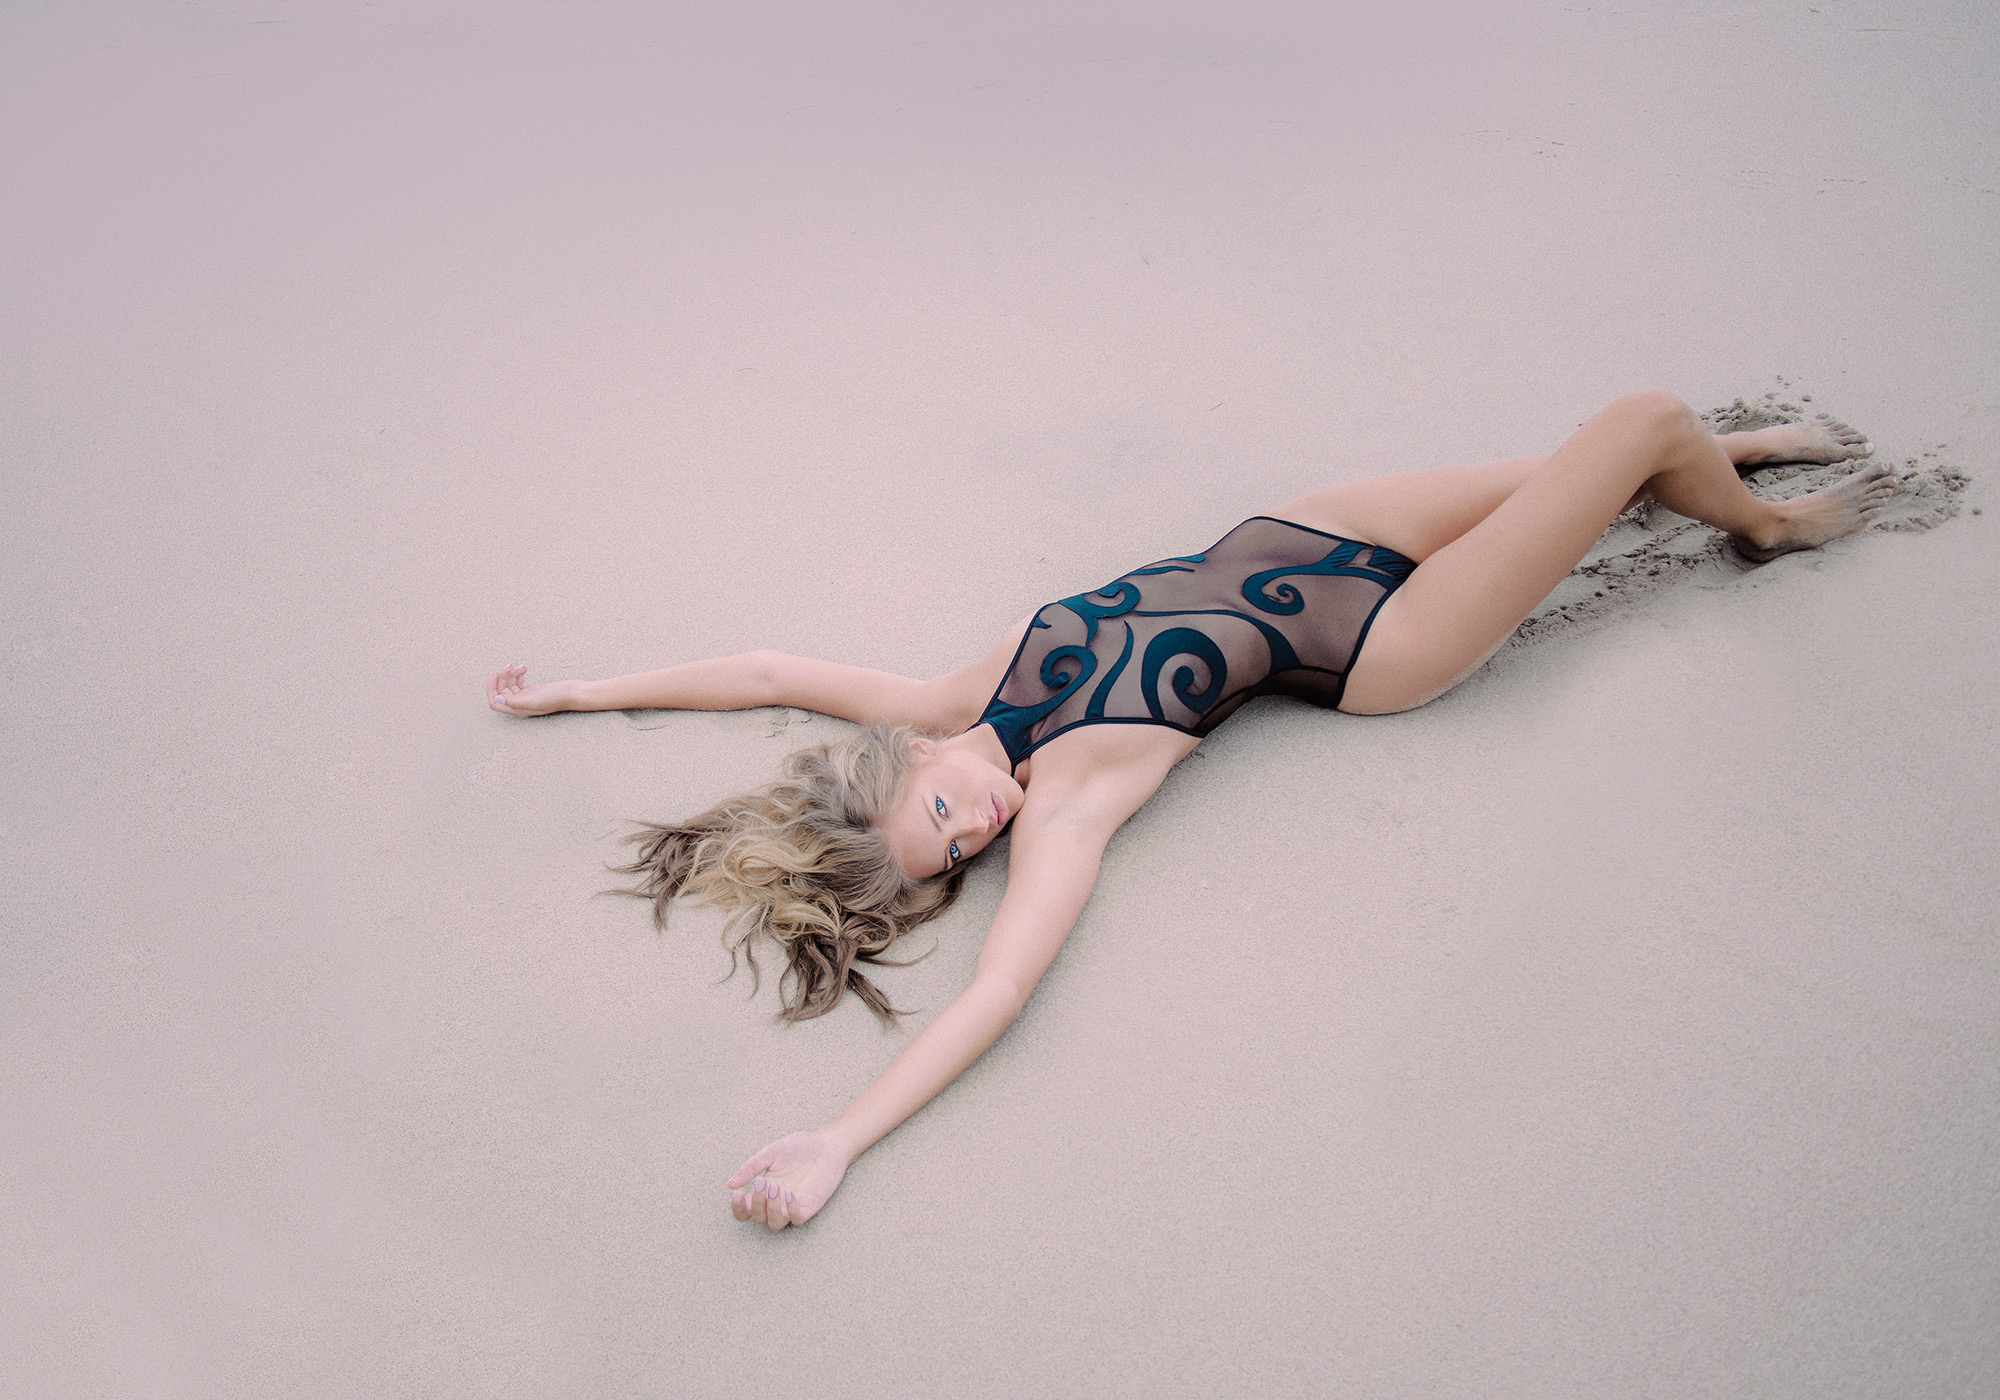 karlaticas_swim+body8.jpg